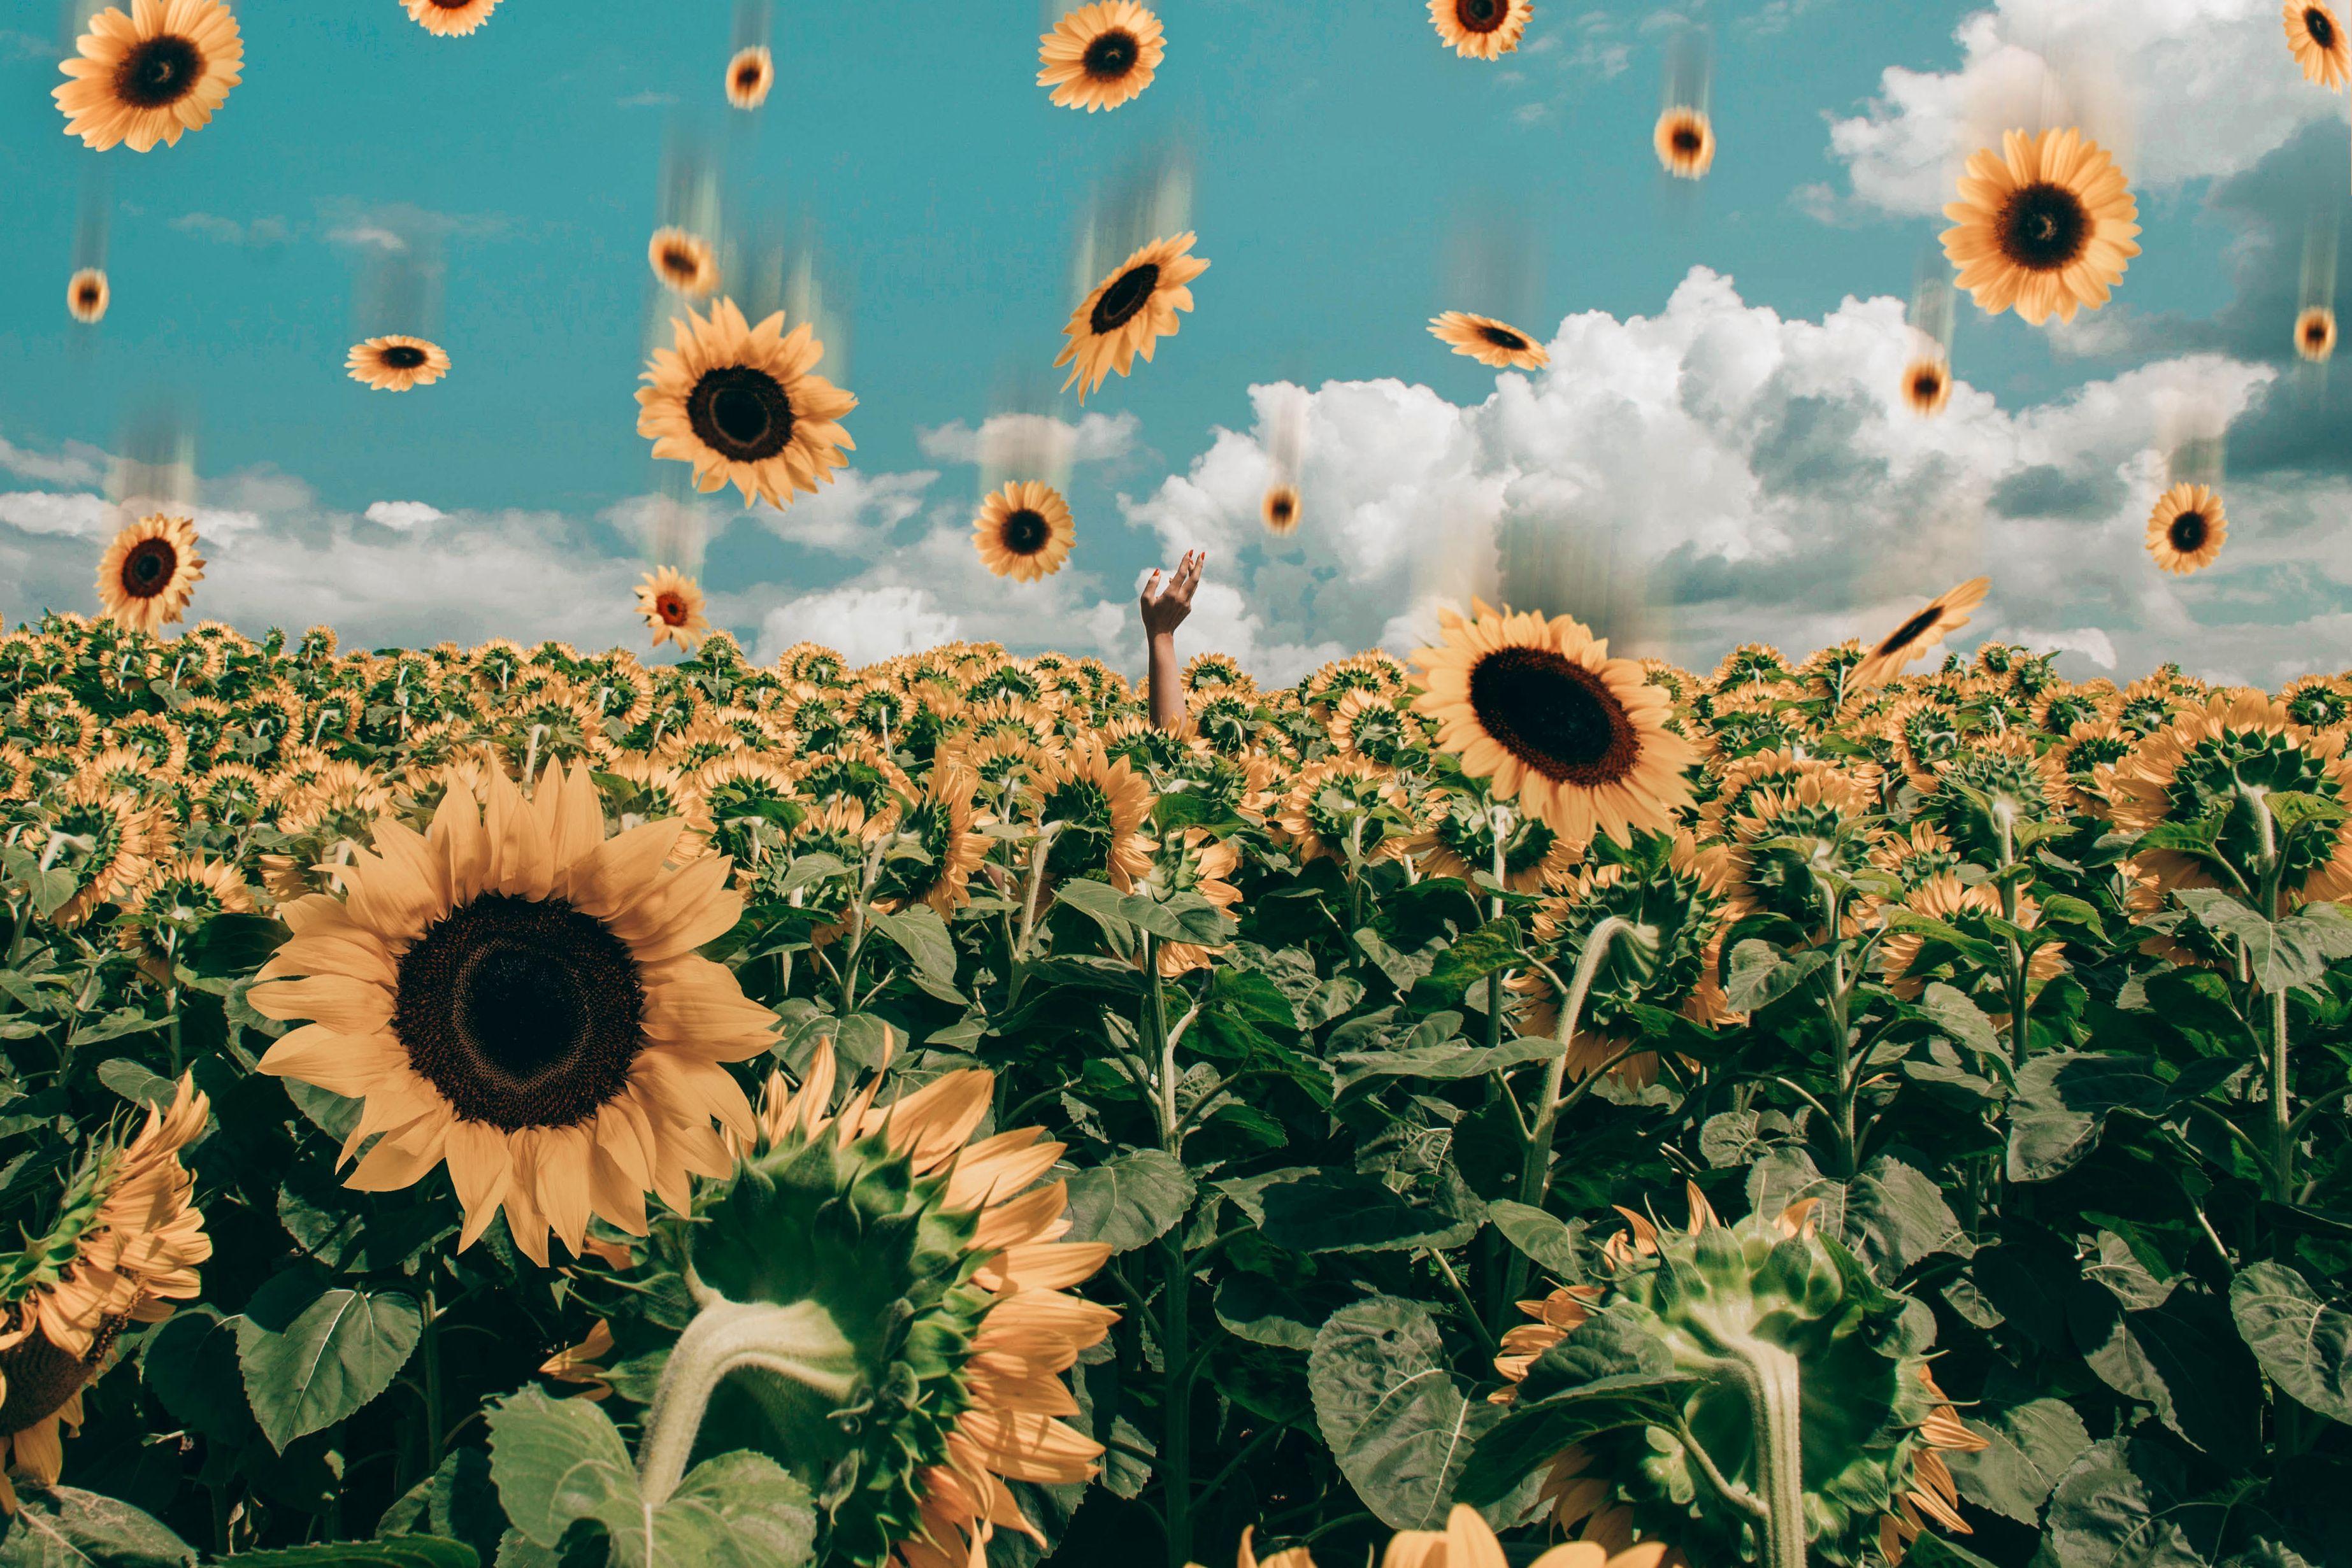 Aesthetic Sunflower Horizontal Wallpapers - Wallpaper Cave